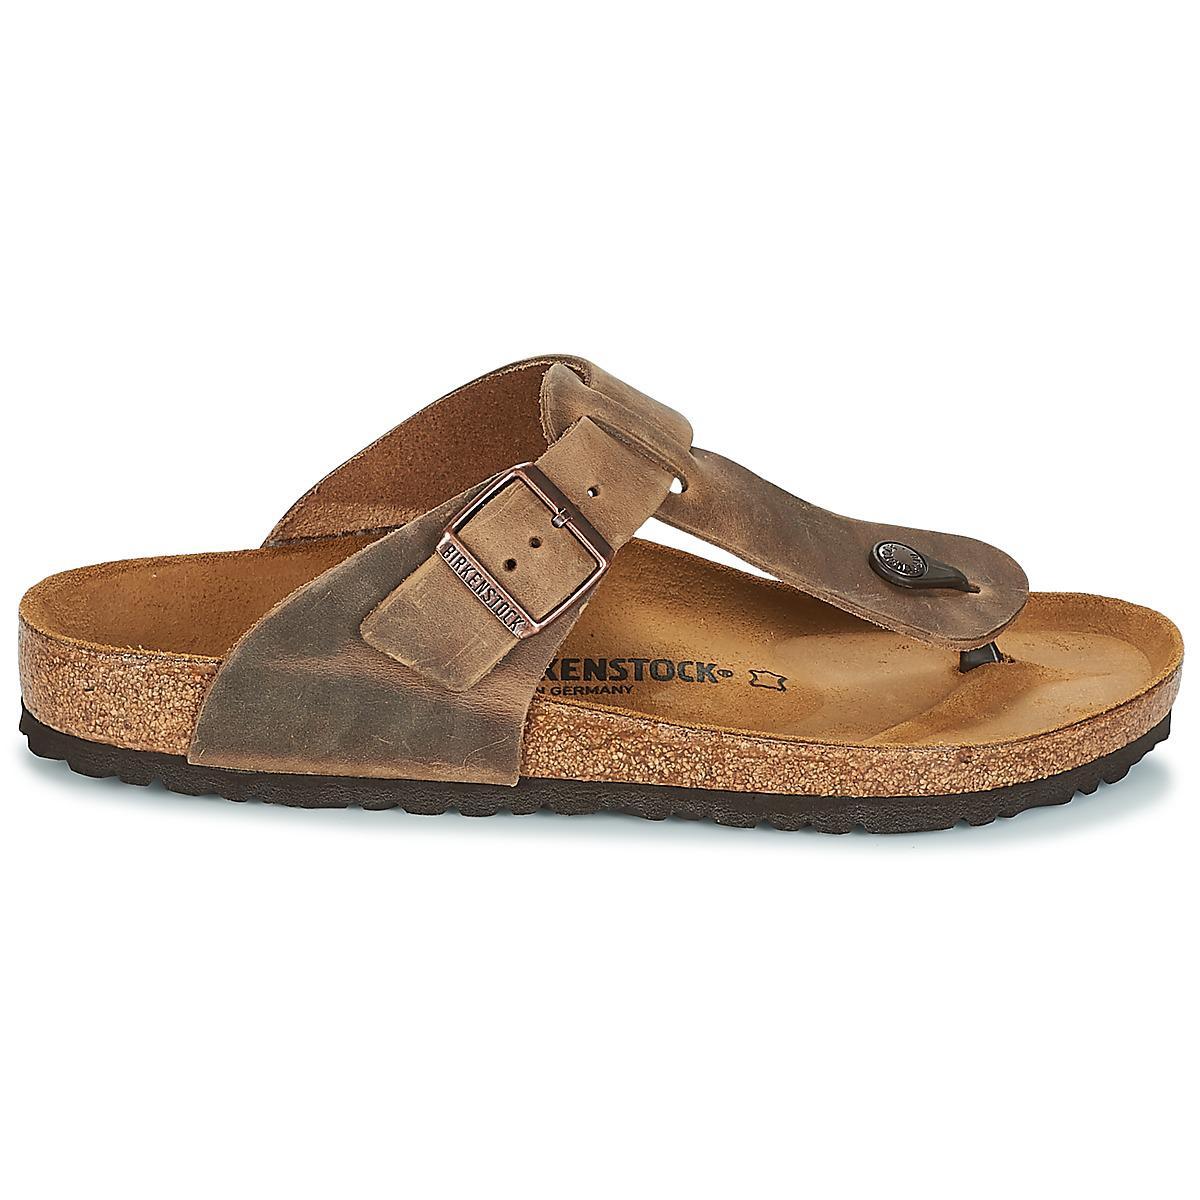 890457721665 Birkenstock - Brown Medina Flip Flops   Sandals (shoes) for Men - Lyst.  View fullscreen